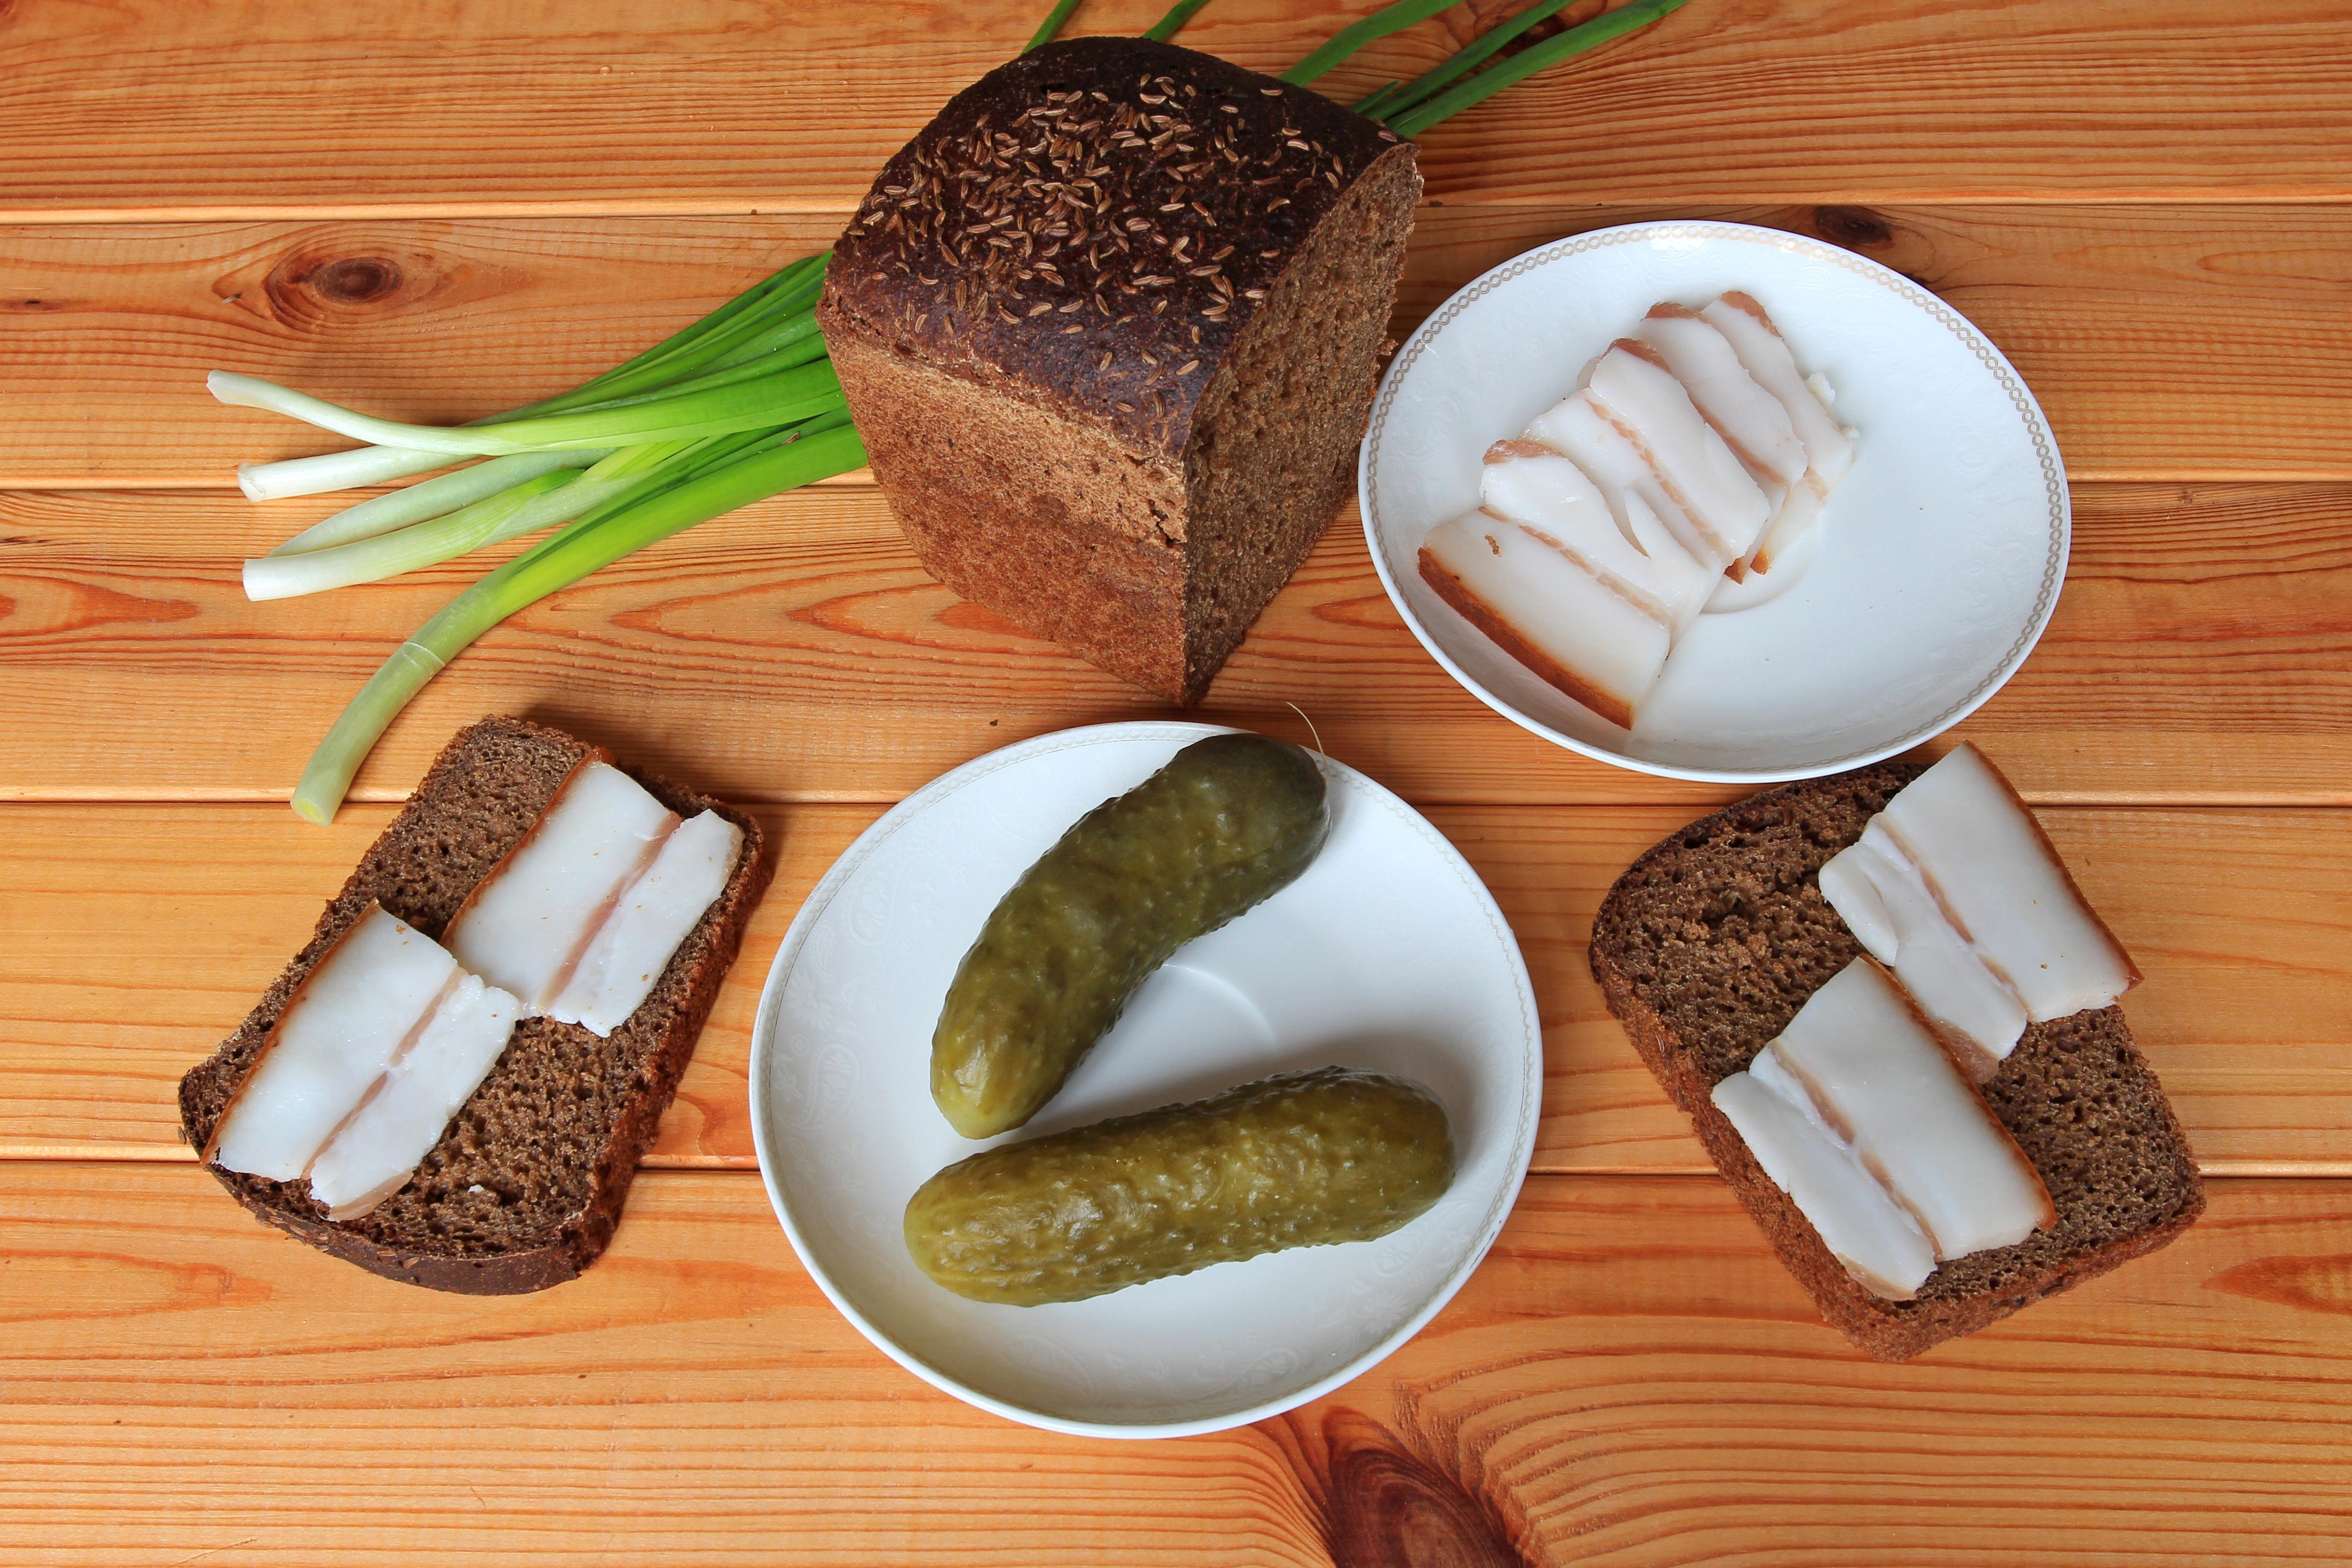 Wallpaper Cucumbers Salo - Food Bread Food Saucer 5184x3456